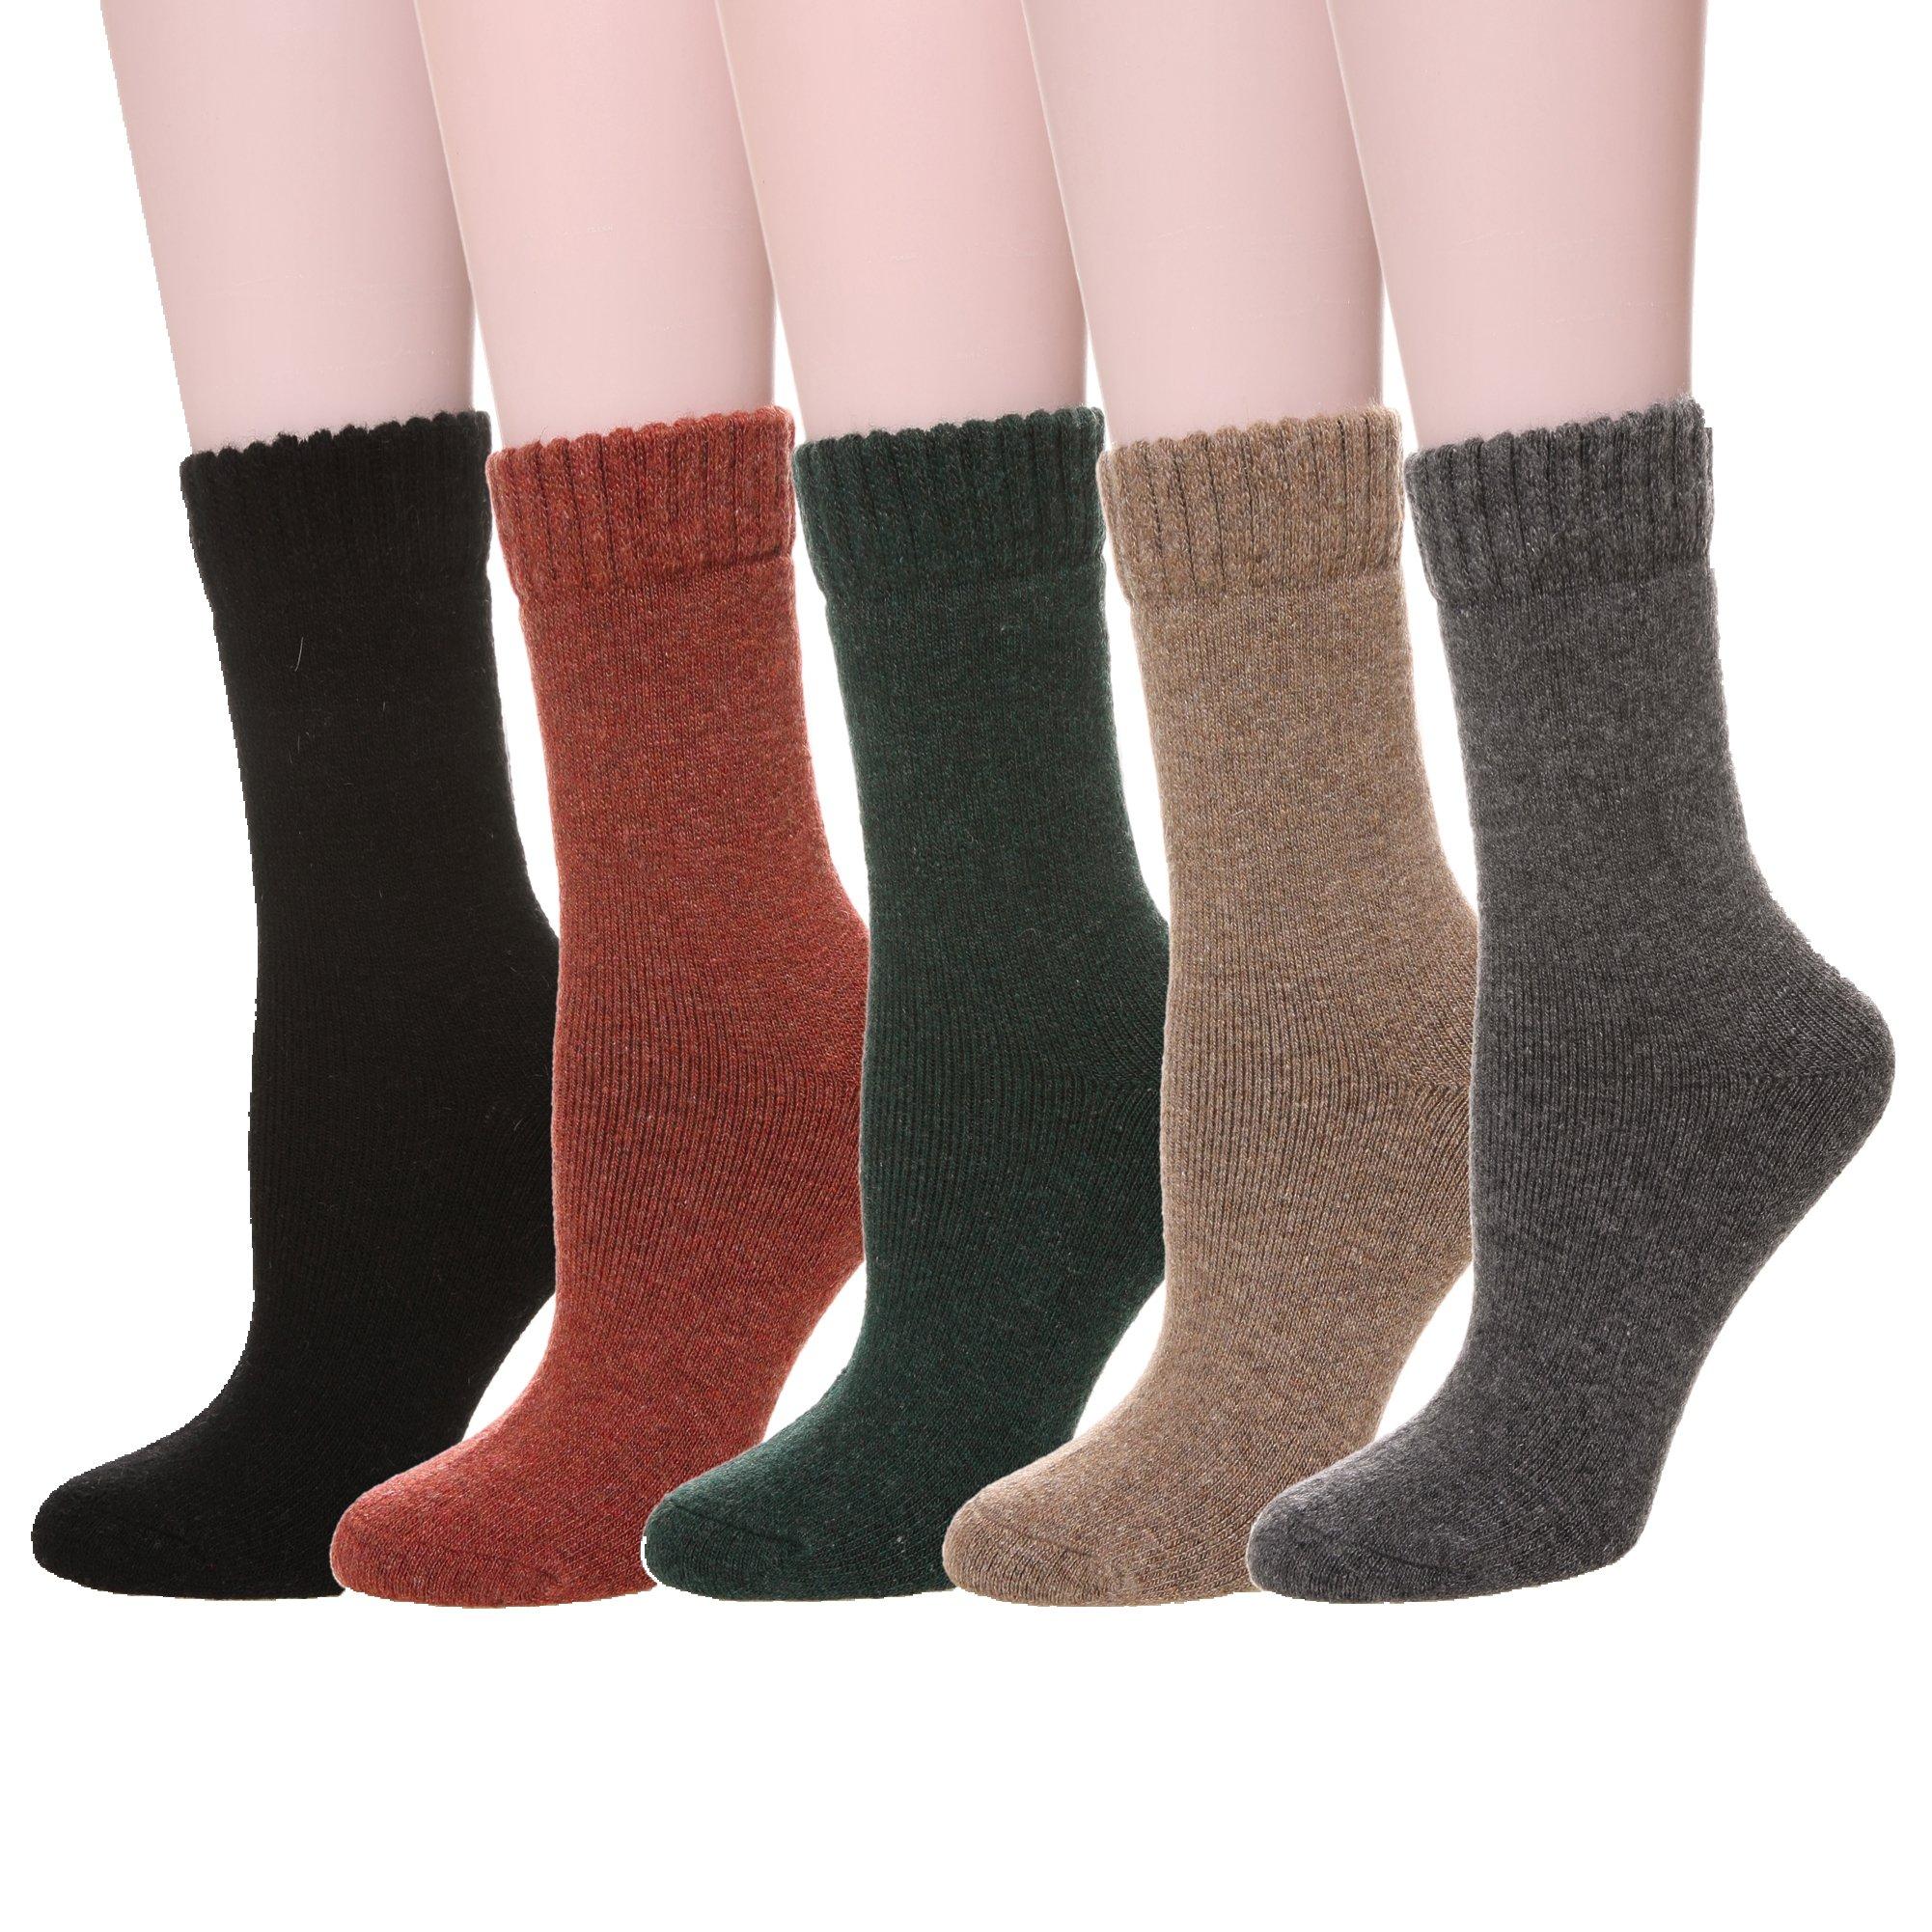 Velice Womens Super Thick Merino Wool Knit Warm Wool Crew Winter Socks 4-Packs (5 Pairs soild color)